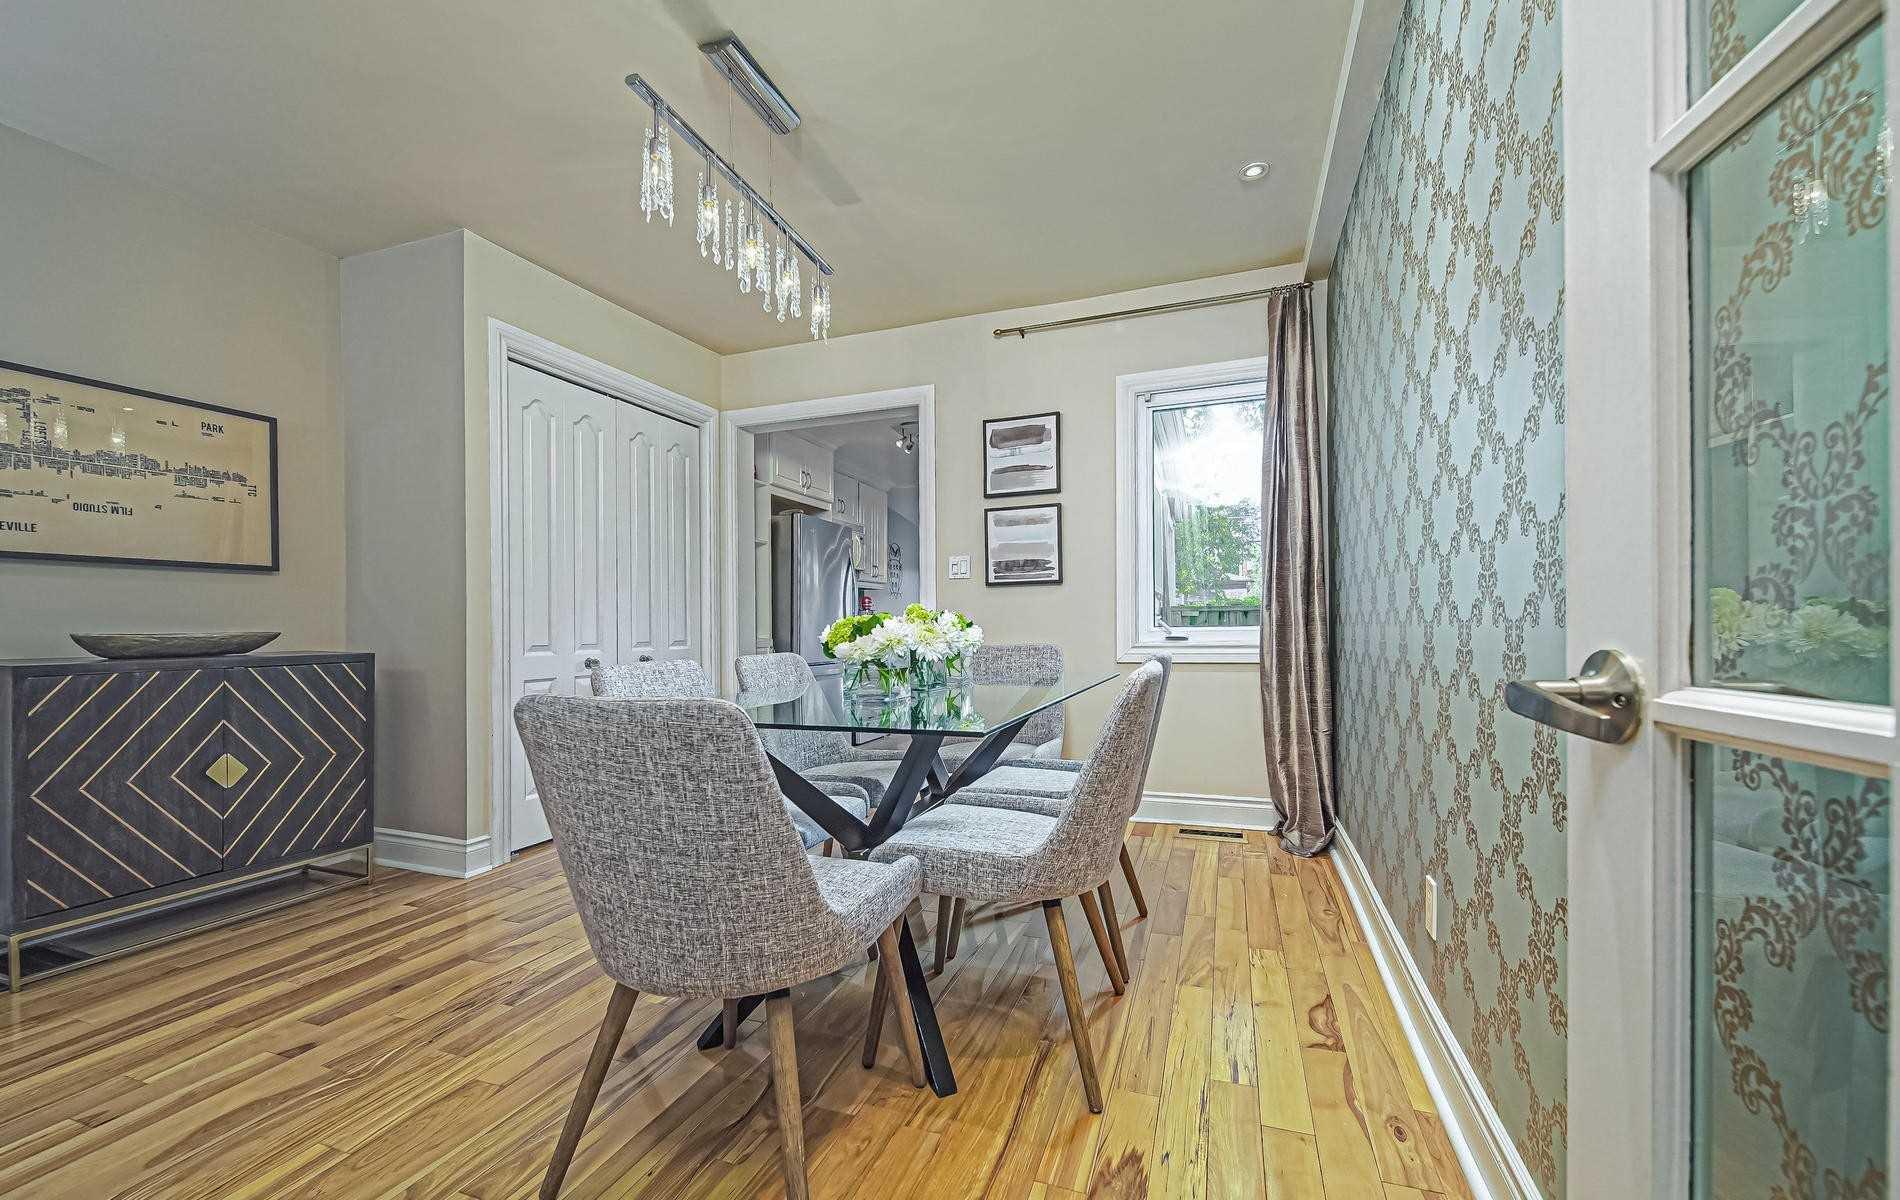 Photo 4: Photos: 84 Rushbrooke Avenue in Toronto: South Riverdale House (2-Storey) for sale (Toronto E01)  : MLS®# E4600791